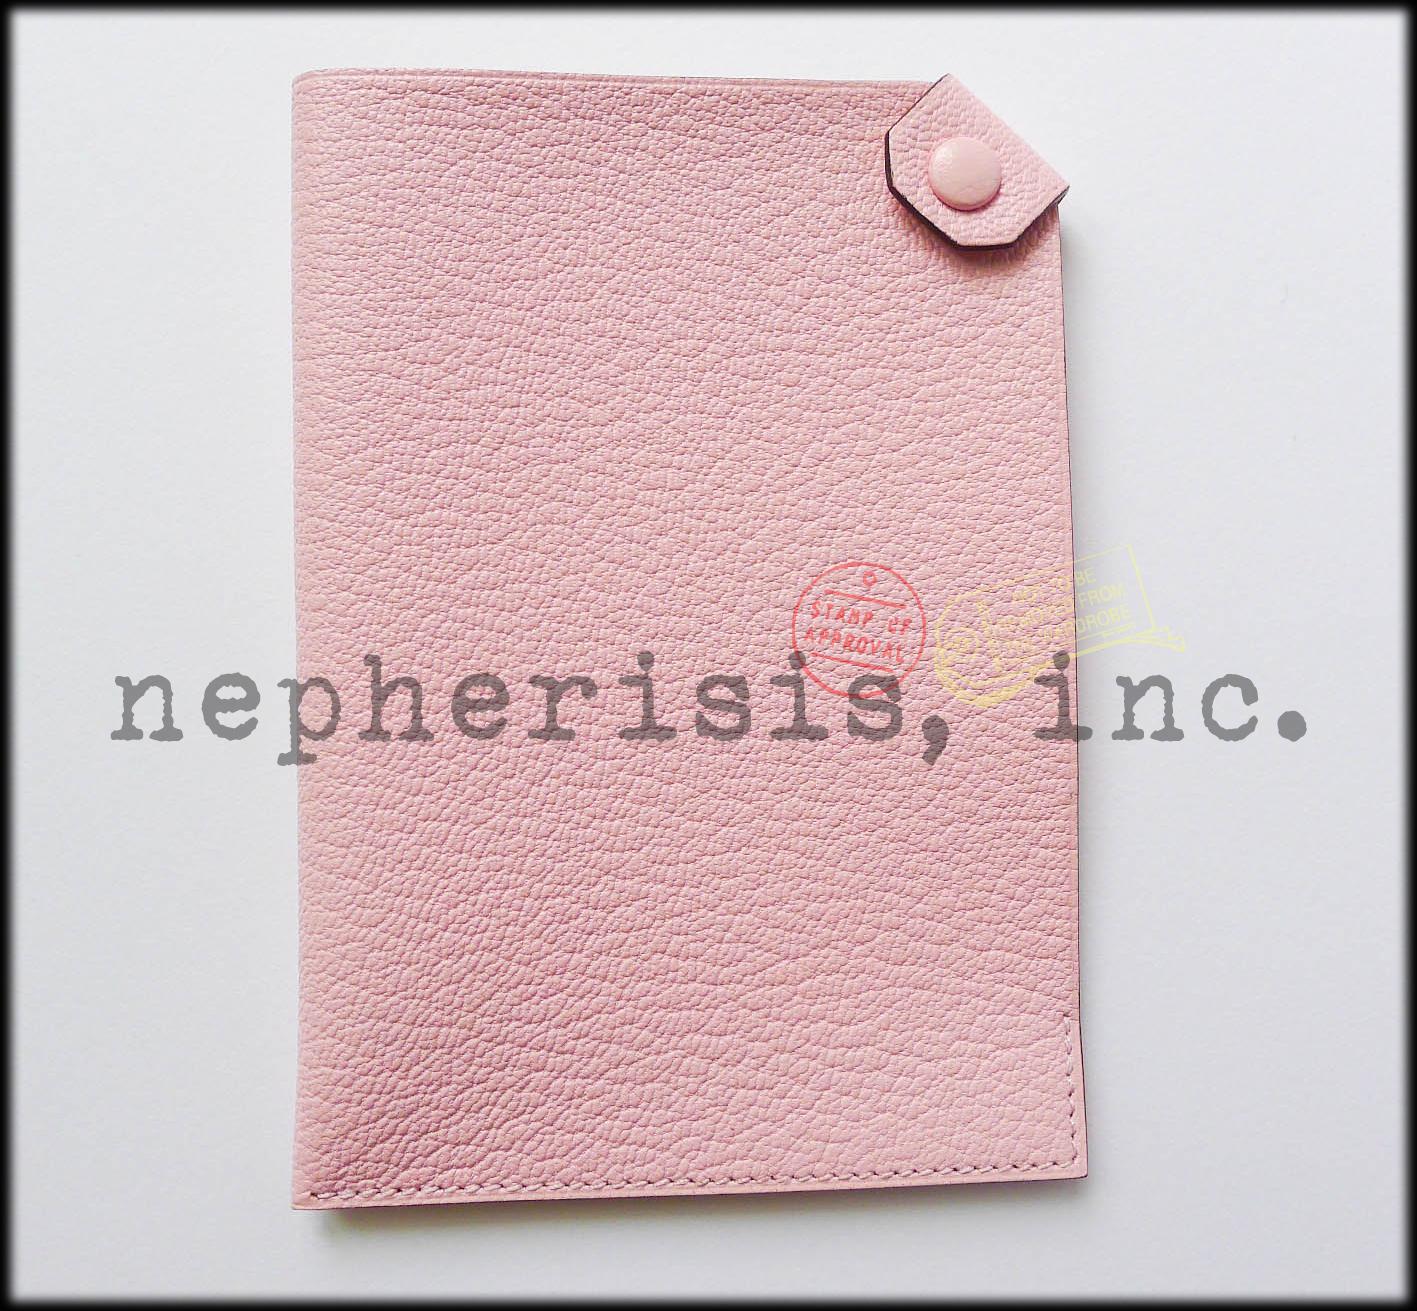 AUTH BNIB Hermes TARMAC PM Passport Holder or Cover in Pink Chevre ROSE SAKURA